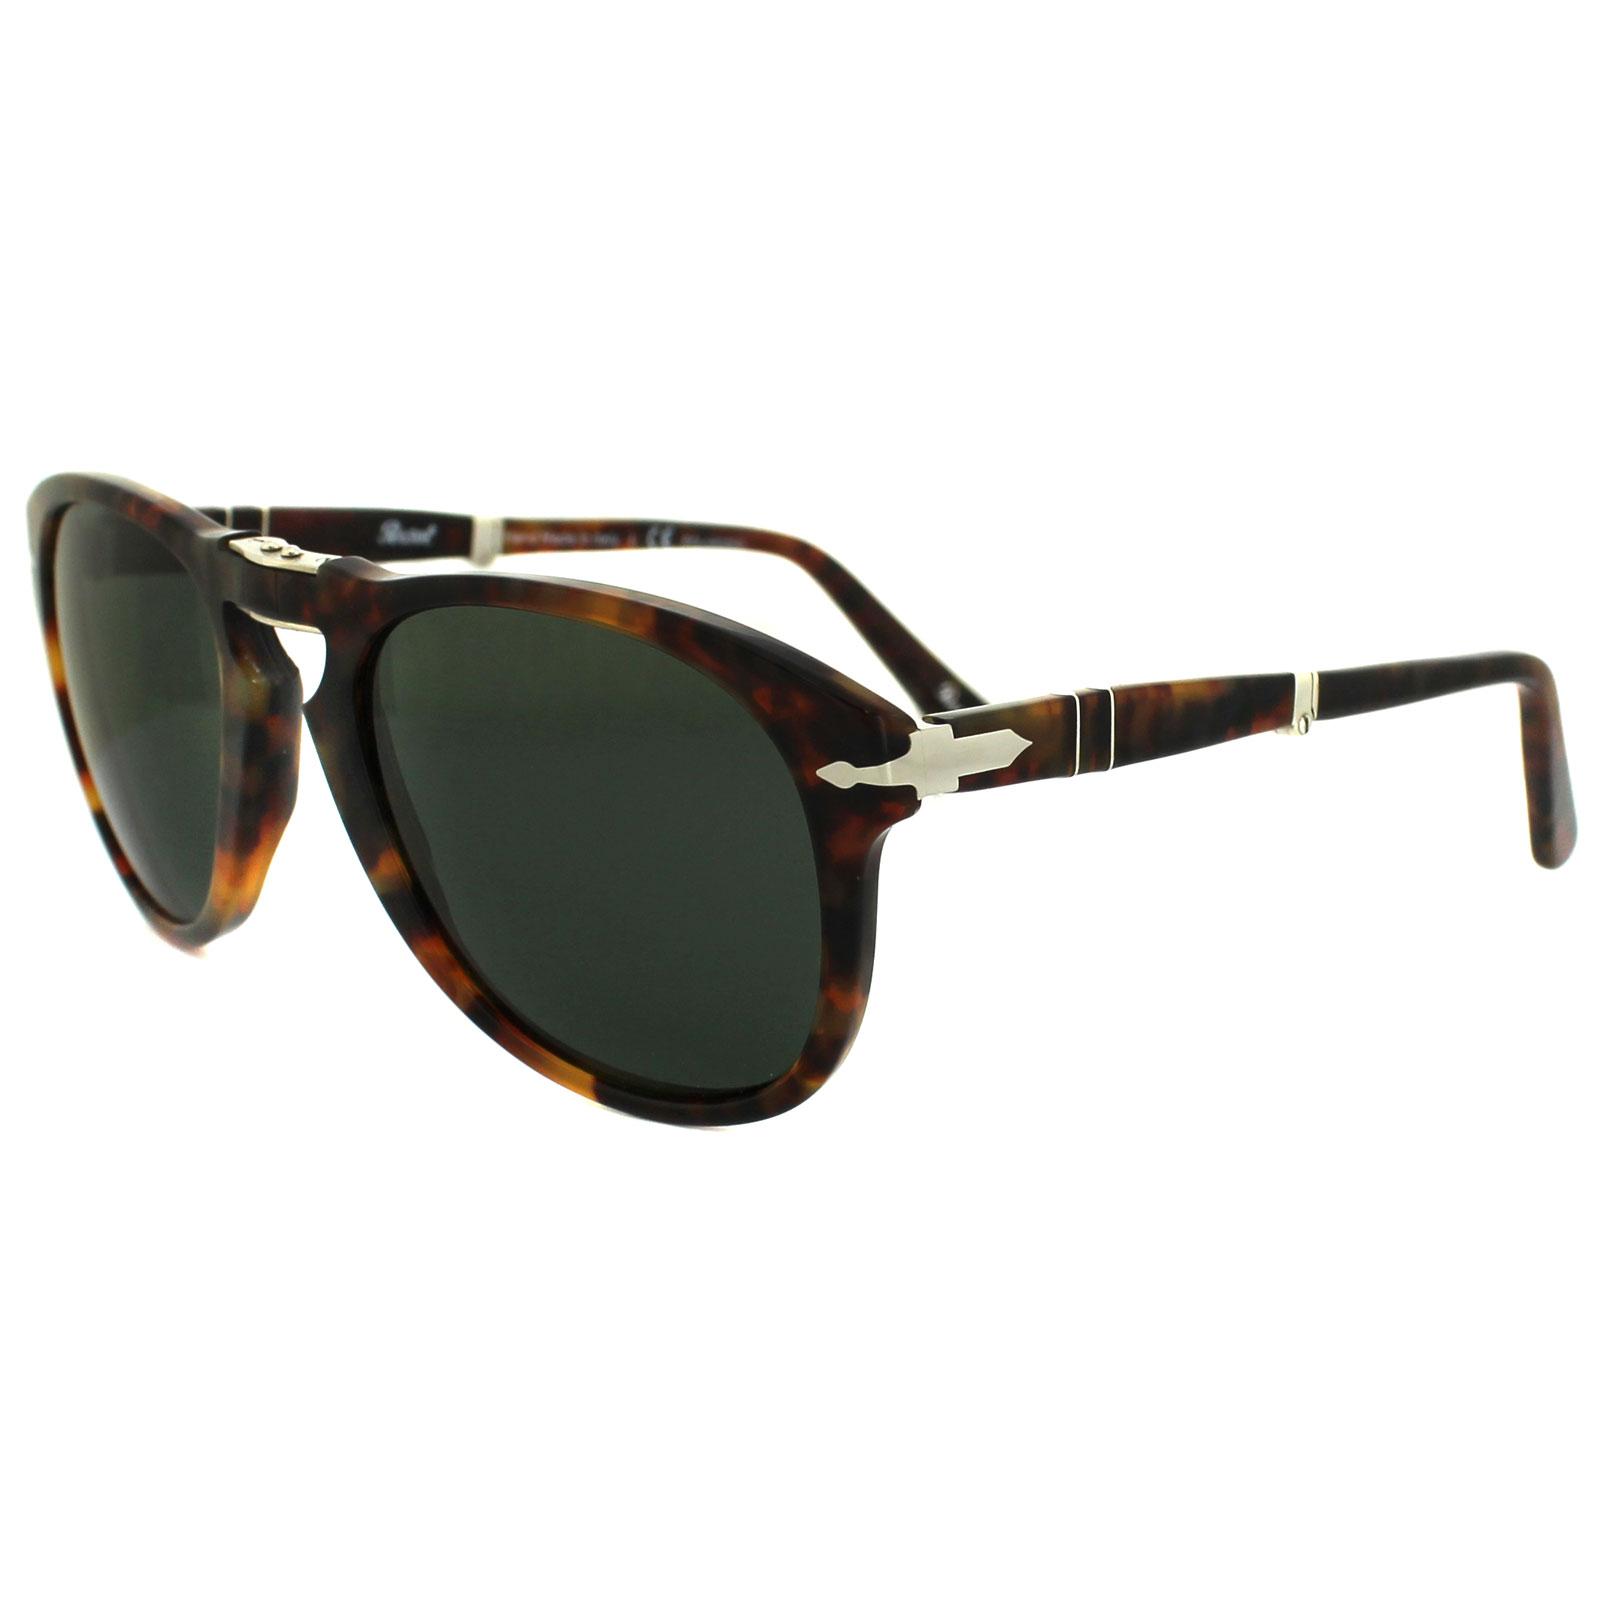 ff94a7698d9e Persol Sunglasses Ebay Uk